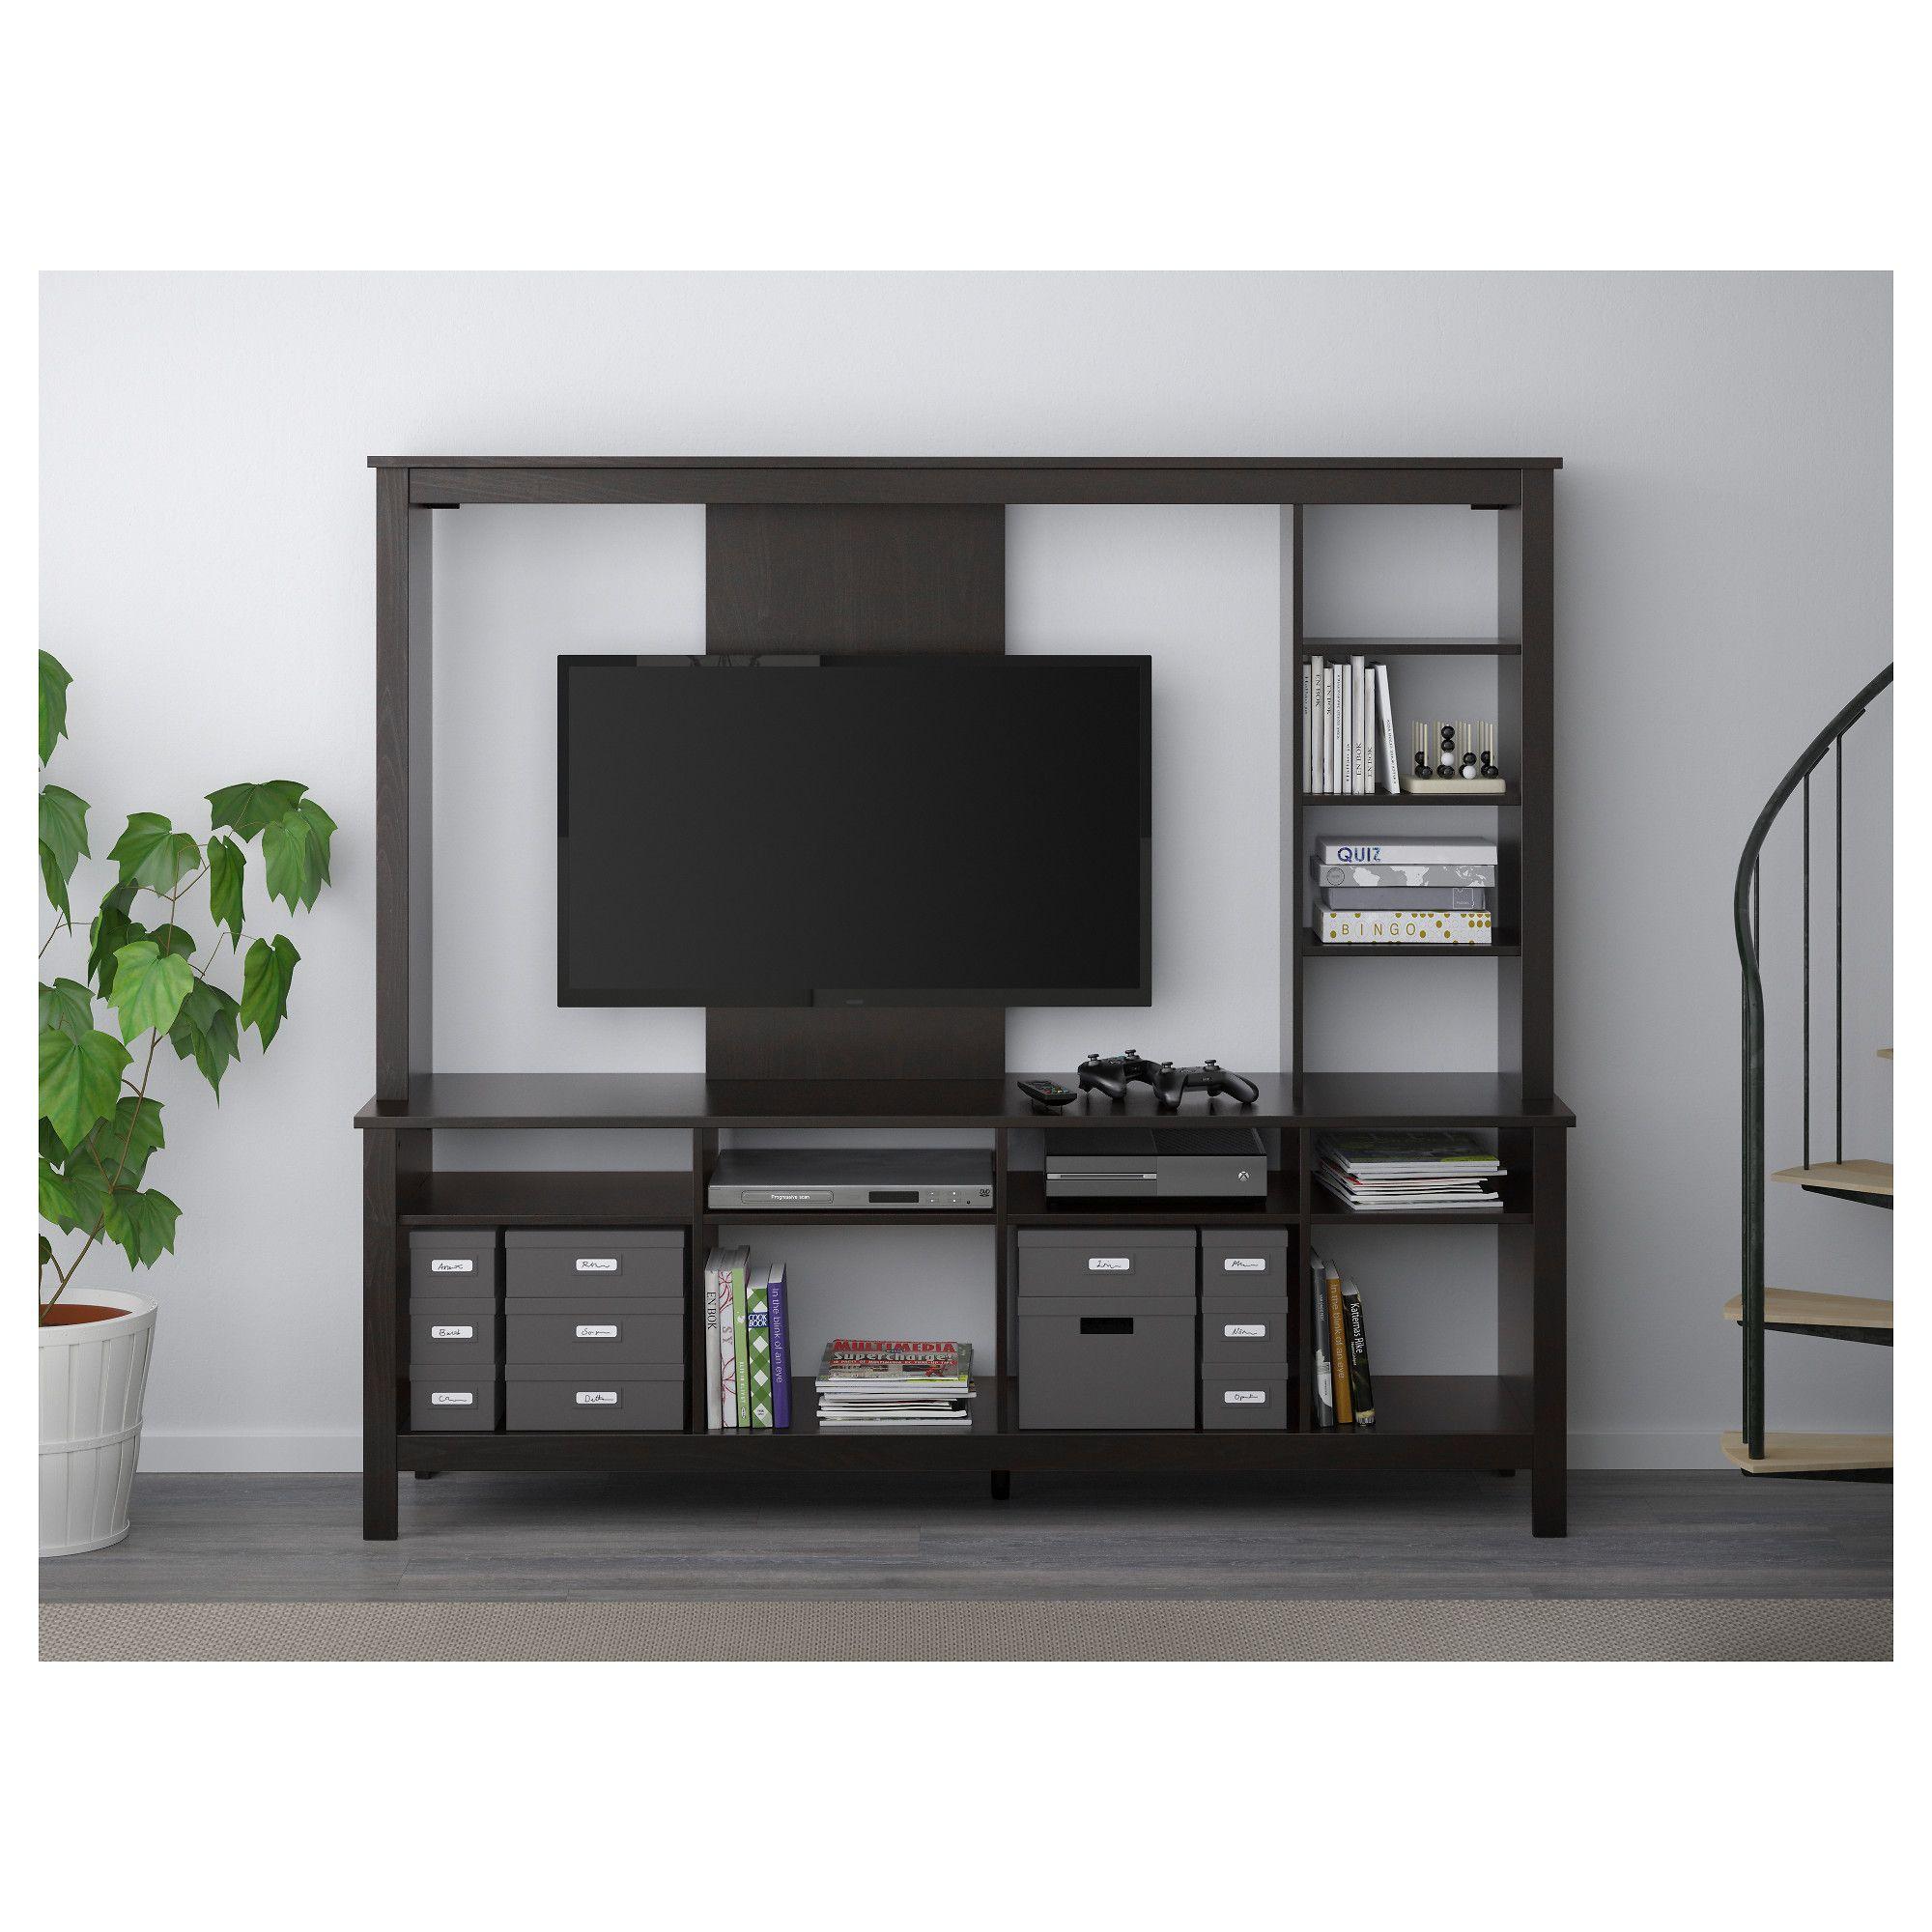 ikea - tomnÄs tv storage unit black-brown | nook and cranny | tv